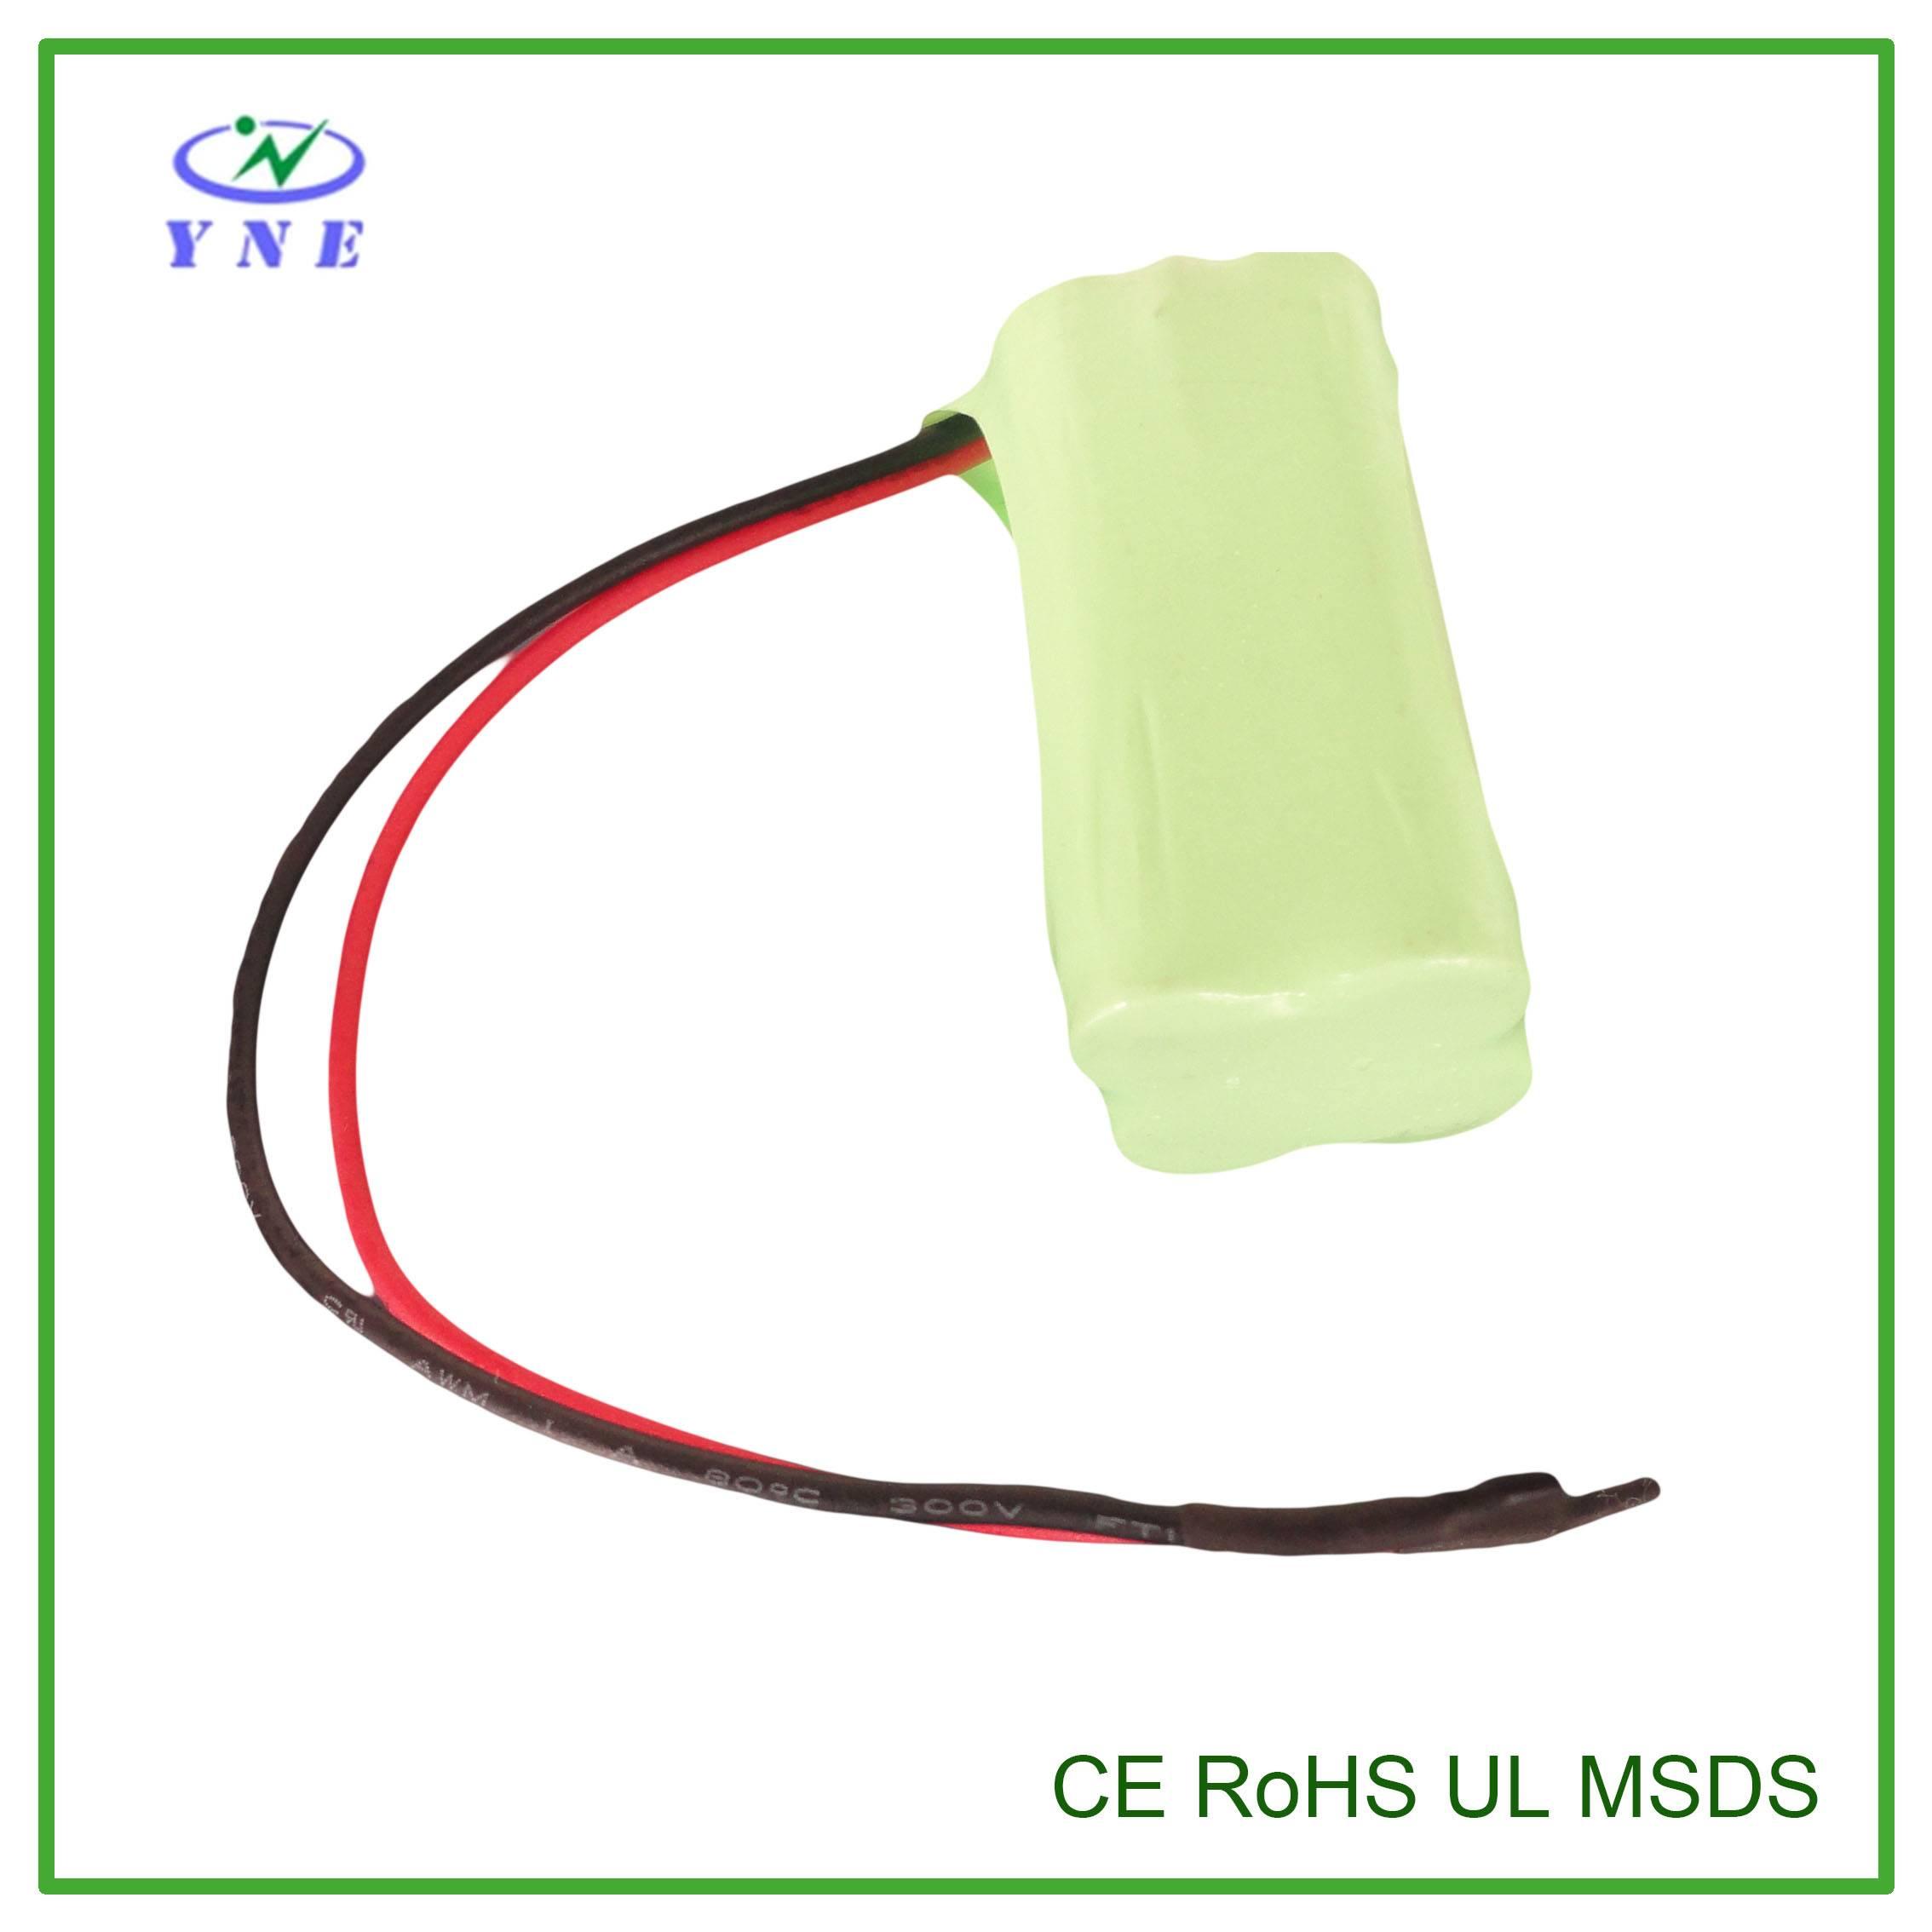 AA 4.8V 2200mah Ni-MH Rechargeable Battery